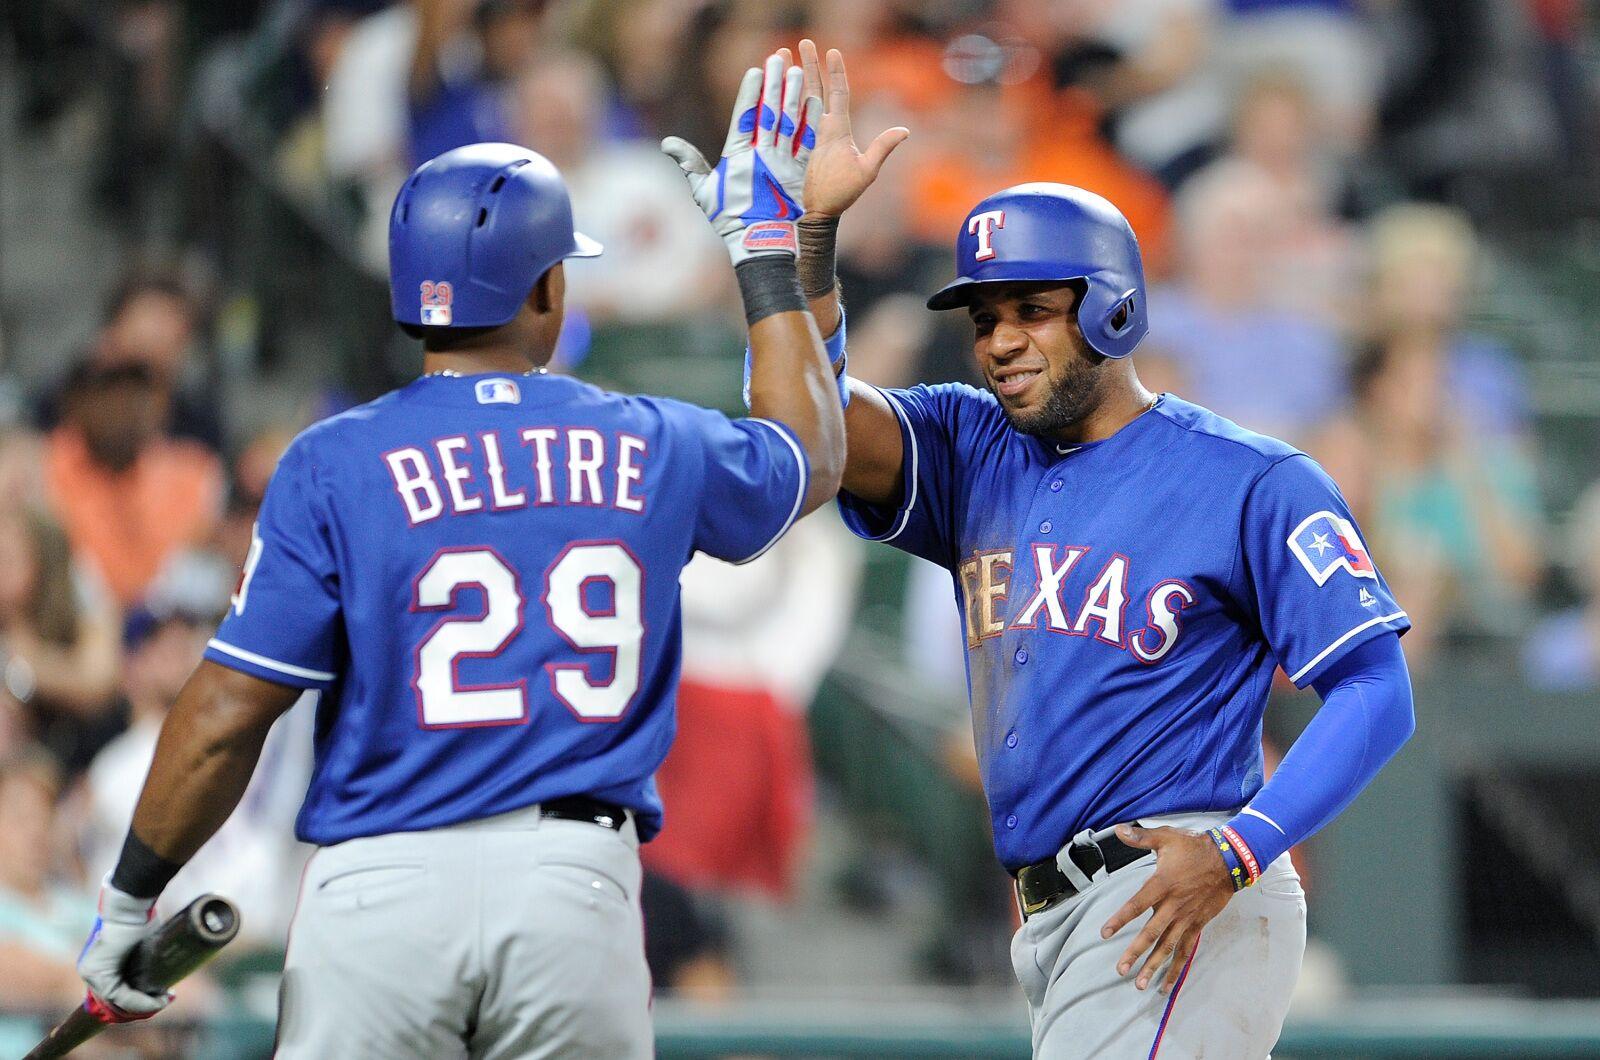 Texas Rangers retiring 29 in honor of Adrian Beltre